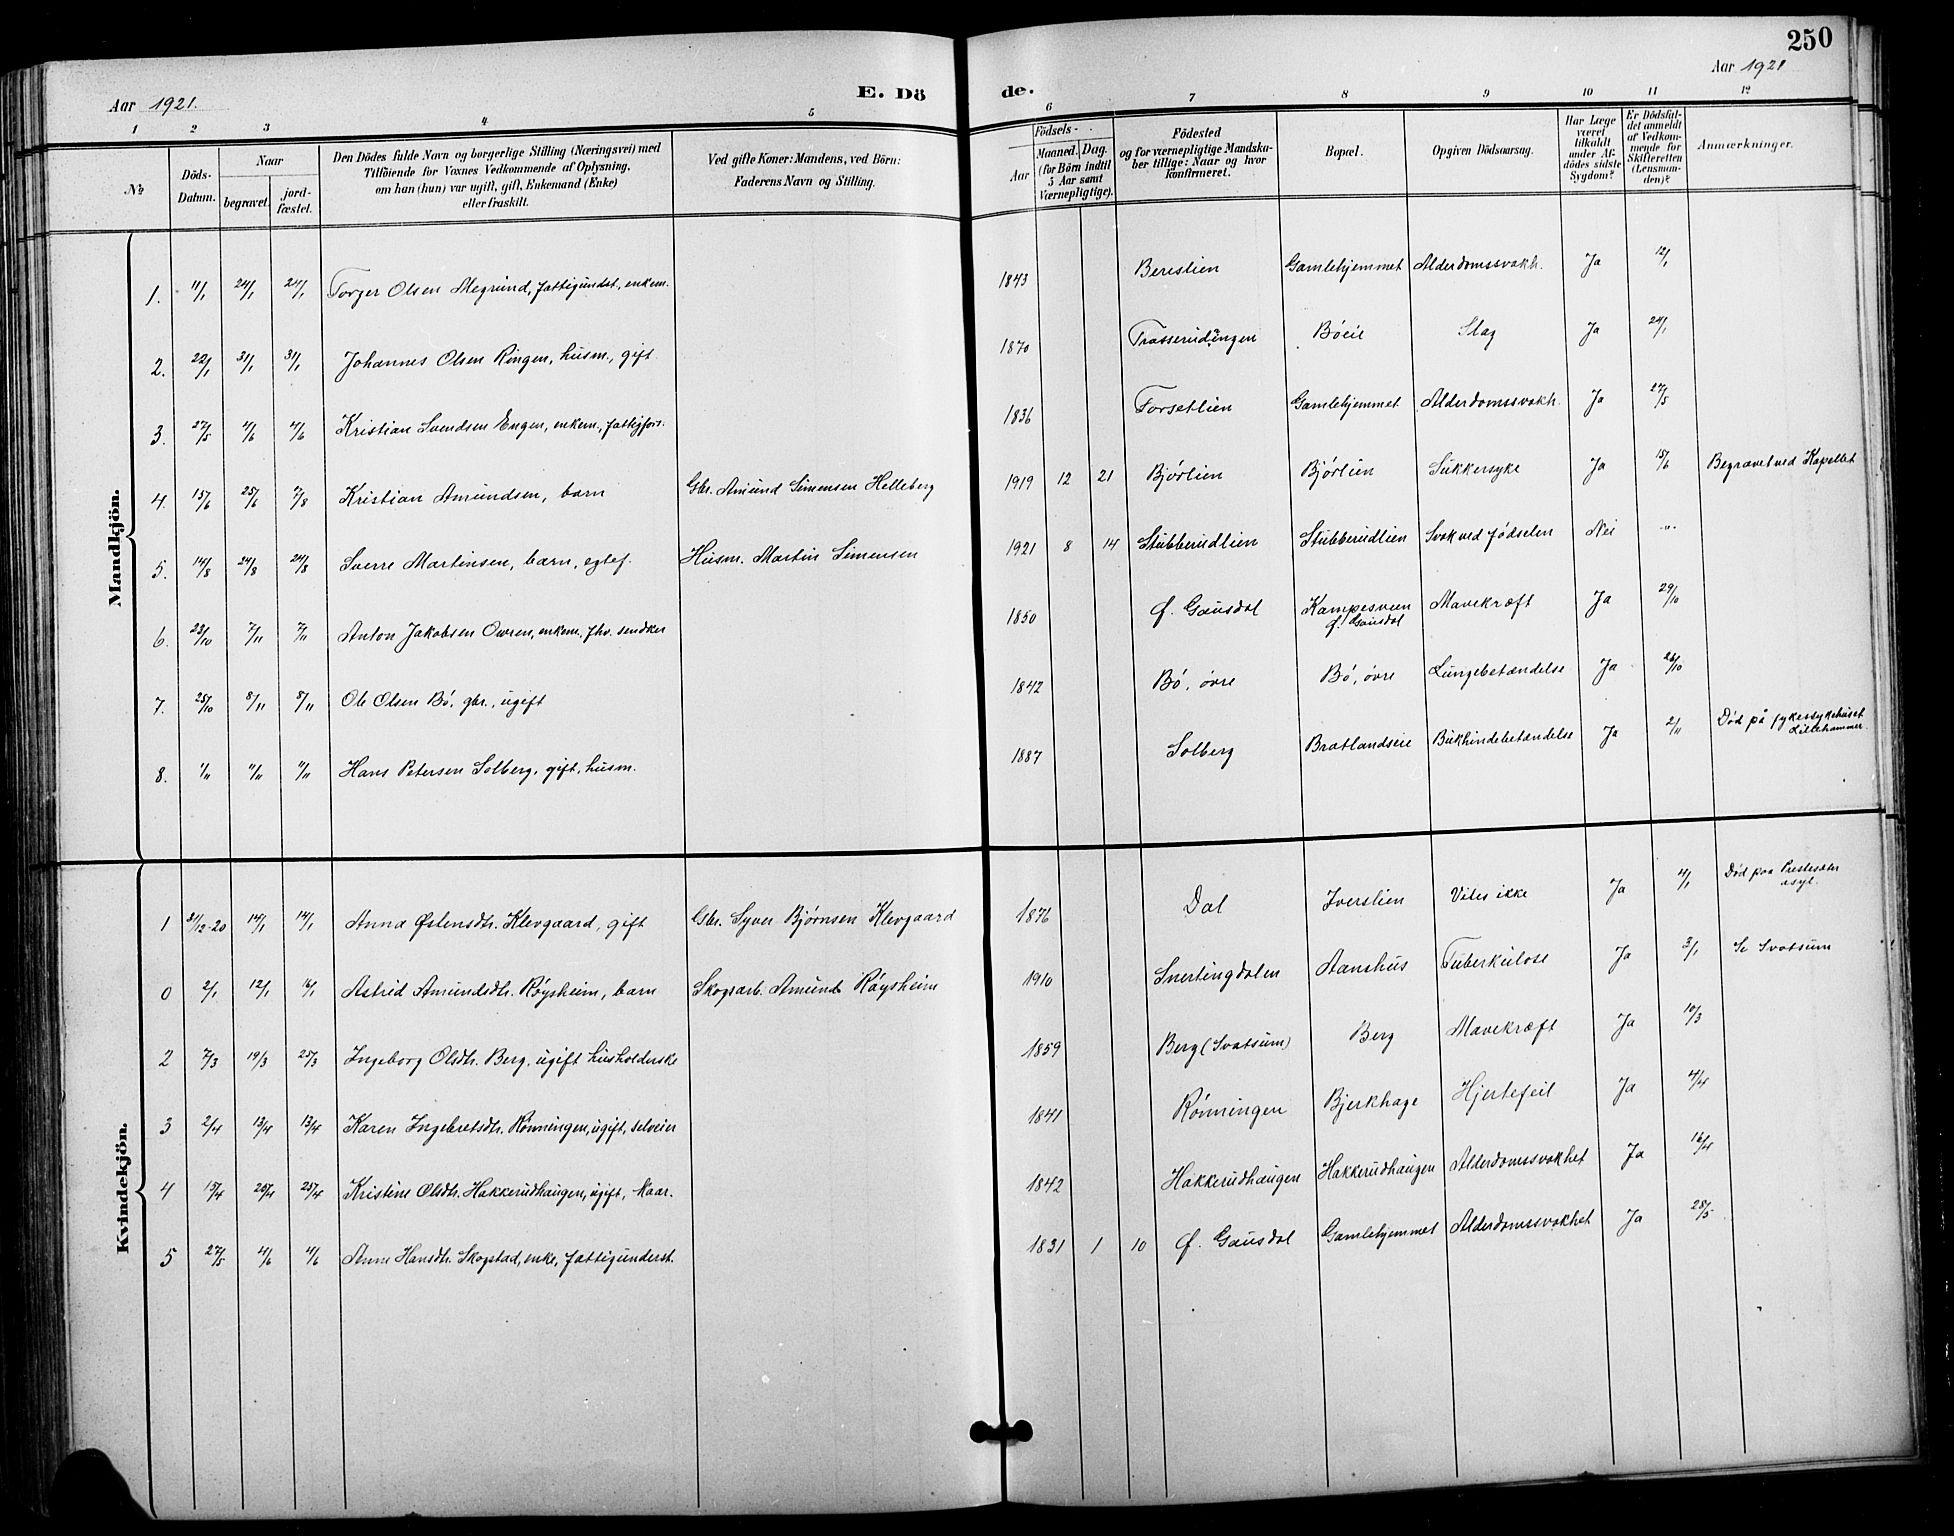 SAH, Vestre Gausdal prestekontor, Klokkerbok nr. 3, 1896-1925, s. 250